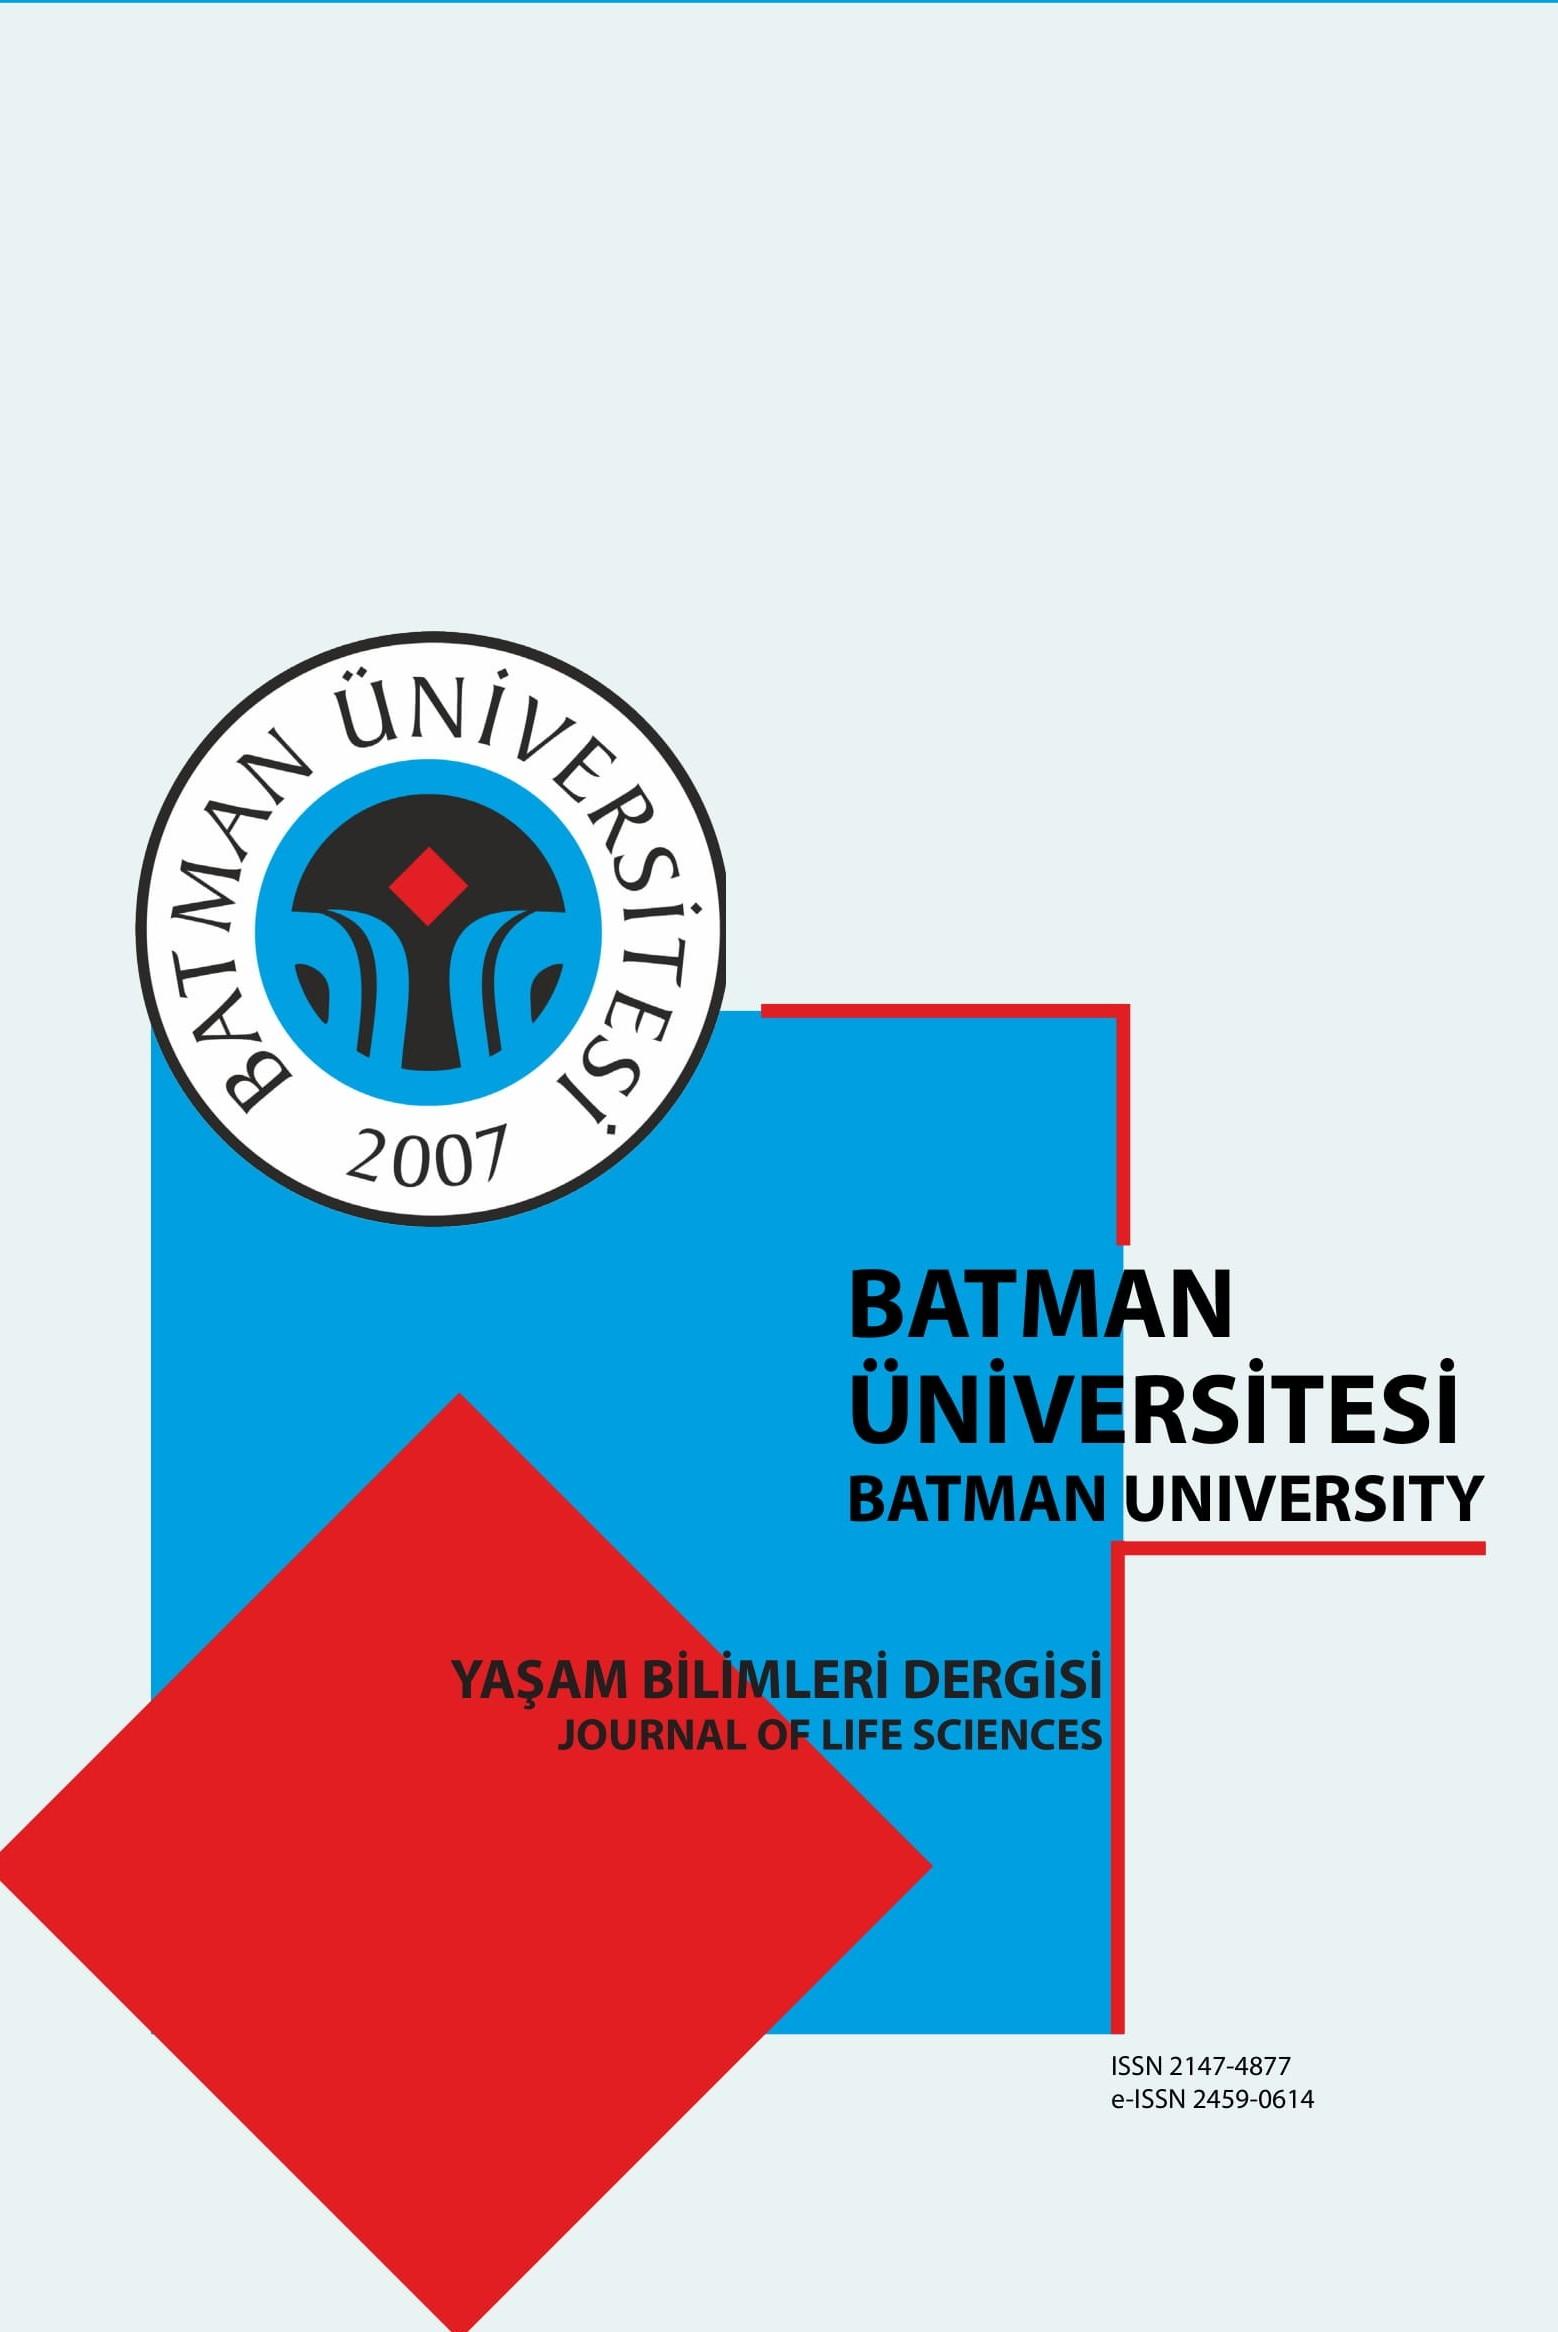 Batman University Journal of Life Sciences